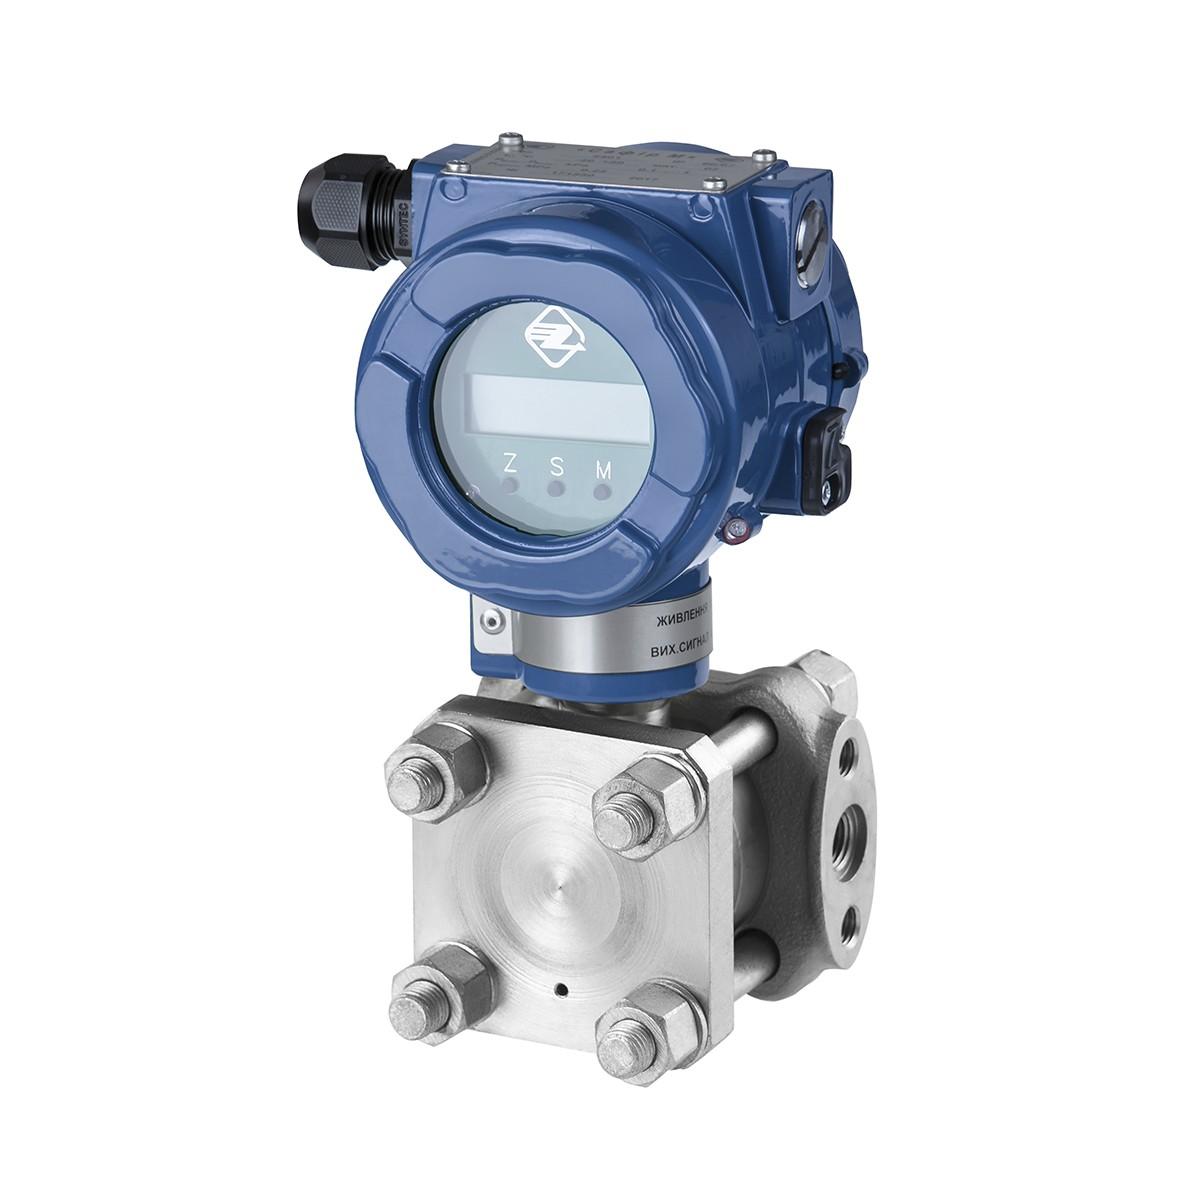 Digital Gauge Pressure Transmitters Safir-M 5110, 5115, 5120, 5210, 5215, 5220, 5310, 5315, 5320